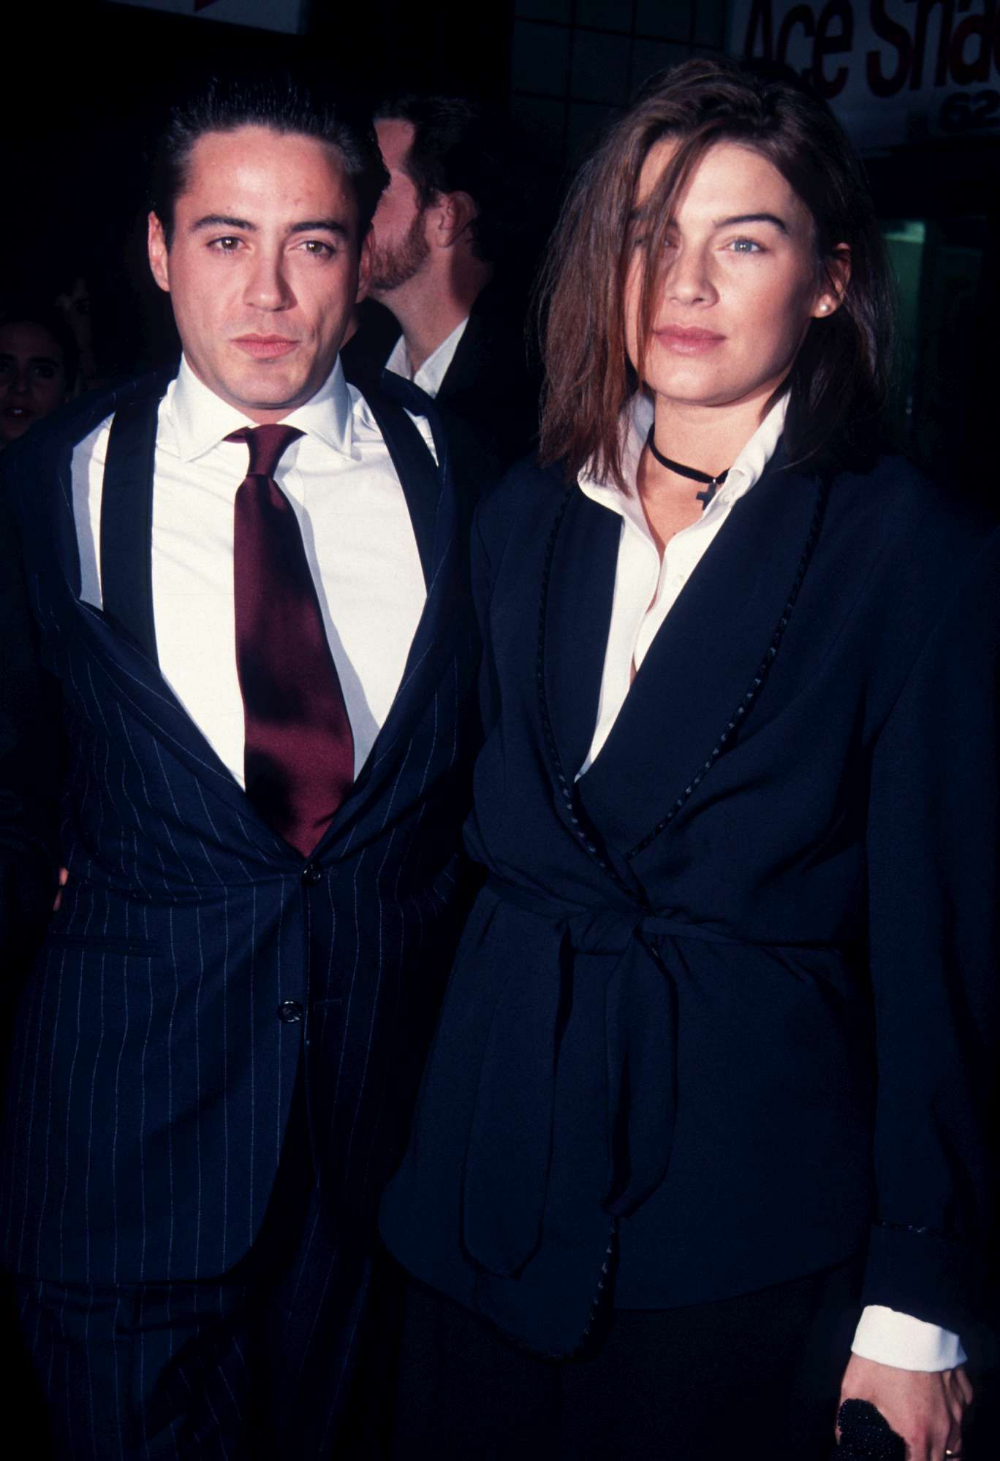 Robert và Deborah Falconer thời mới kết hôn.